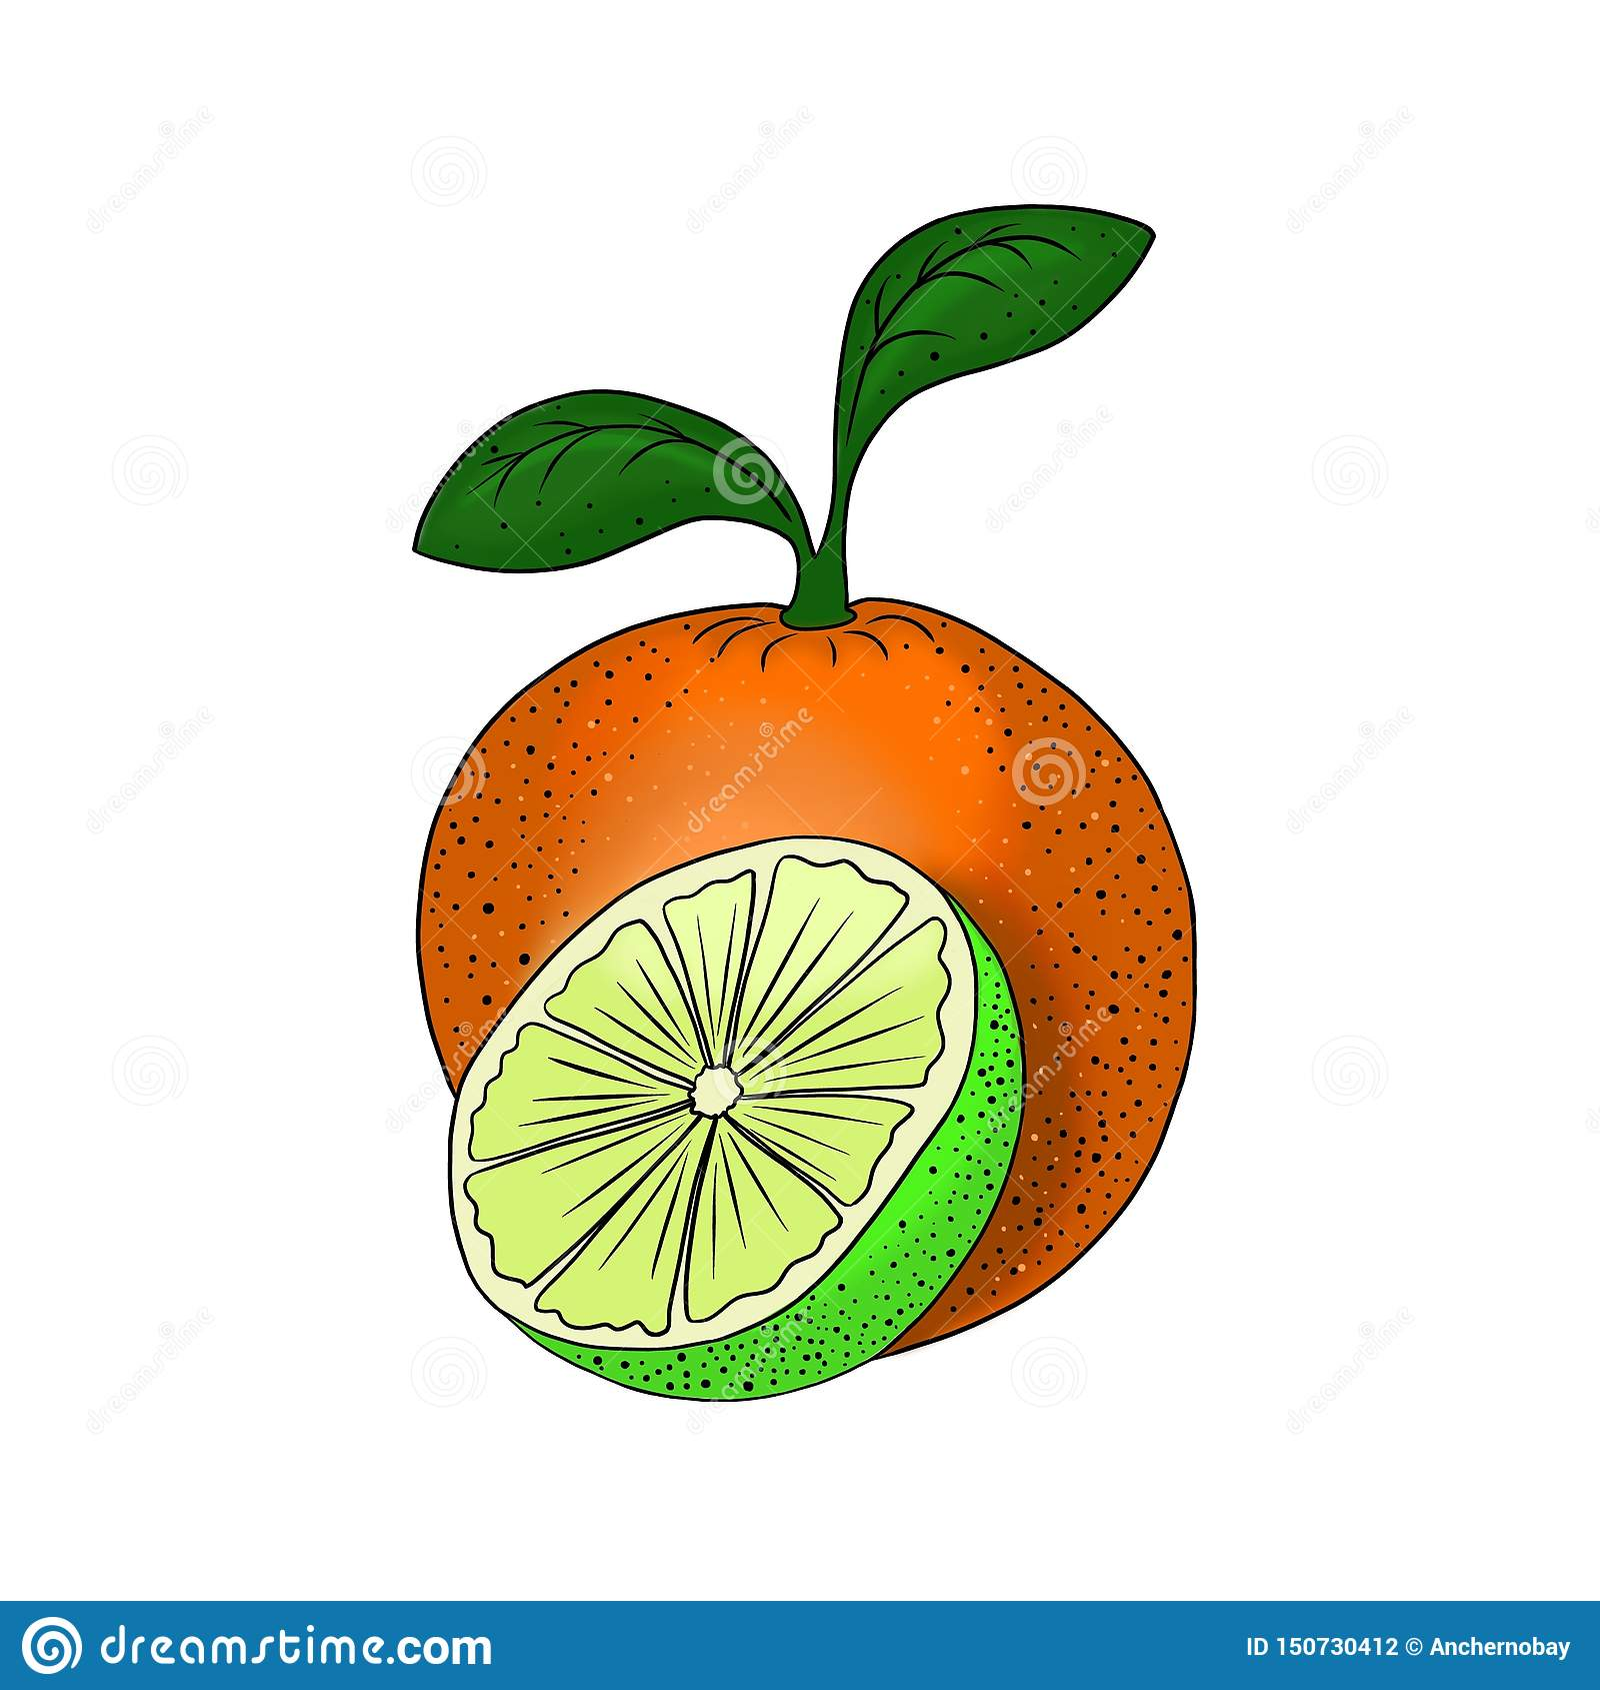 Fruit citrus orange lime illustration vegetarian healthy food element for design isolated on white background